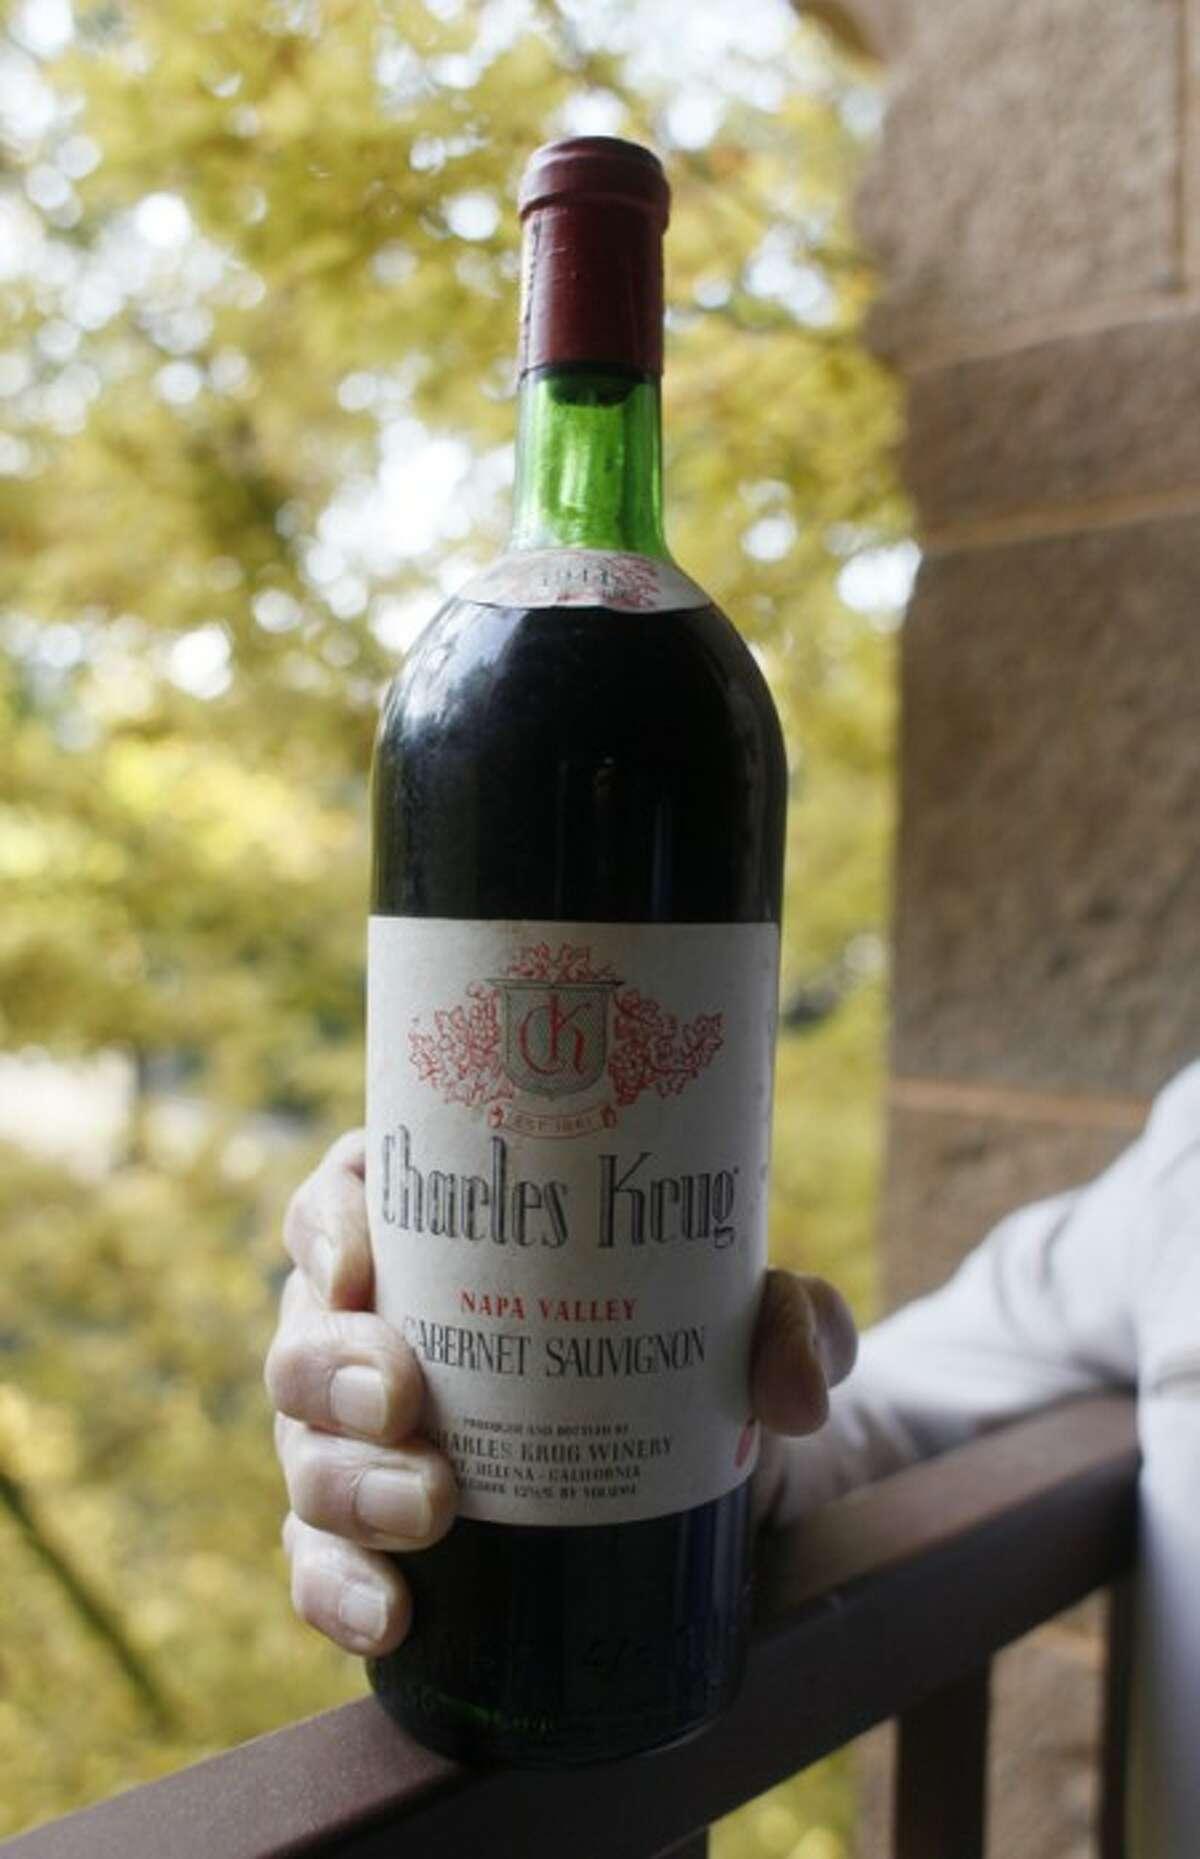 This photo taken Nov. 4, 2009 shows Peter Mondavi Sr. holding a bottle of 1944 Charles Krug Cabernet Sauvignon, the first his family produced.(AP Photo/Eric Risberg)